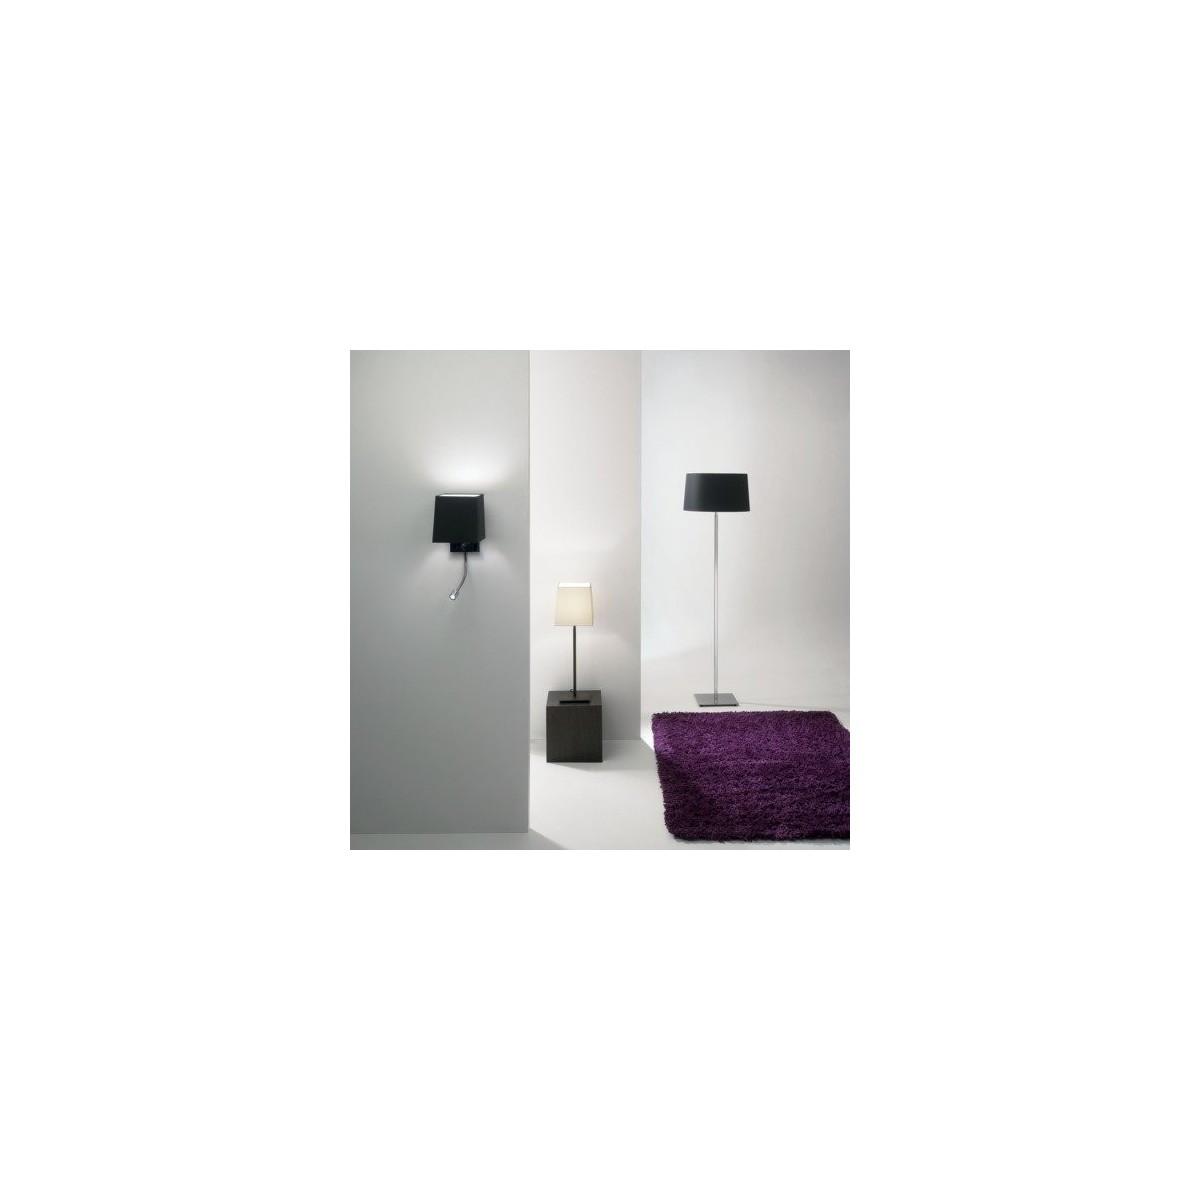 Astro Tapered Square 175 Abażur Biały 5005001